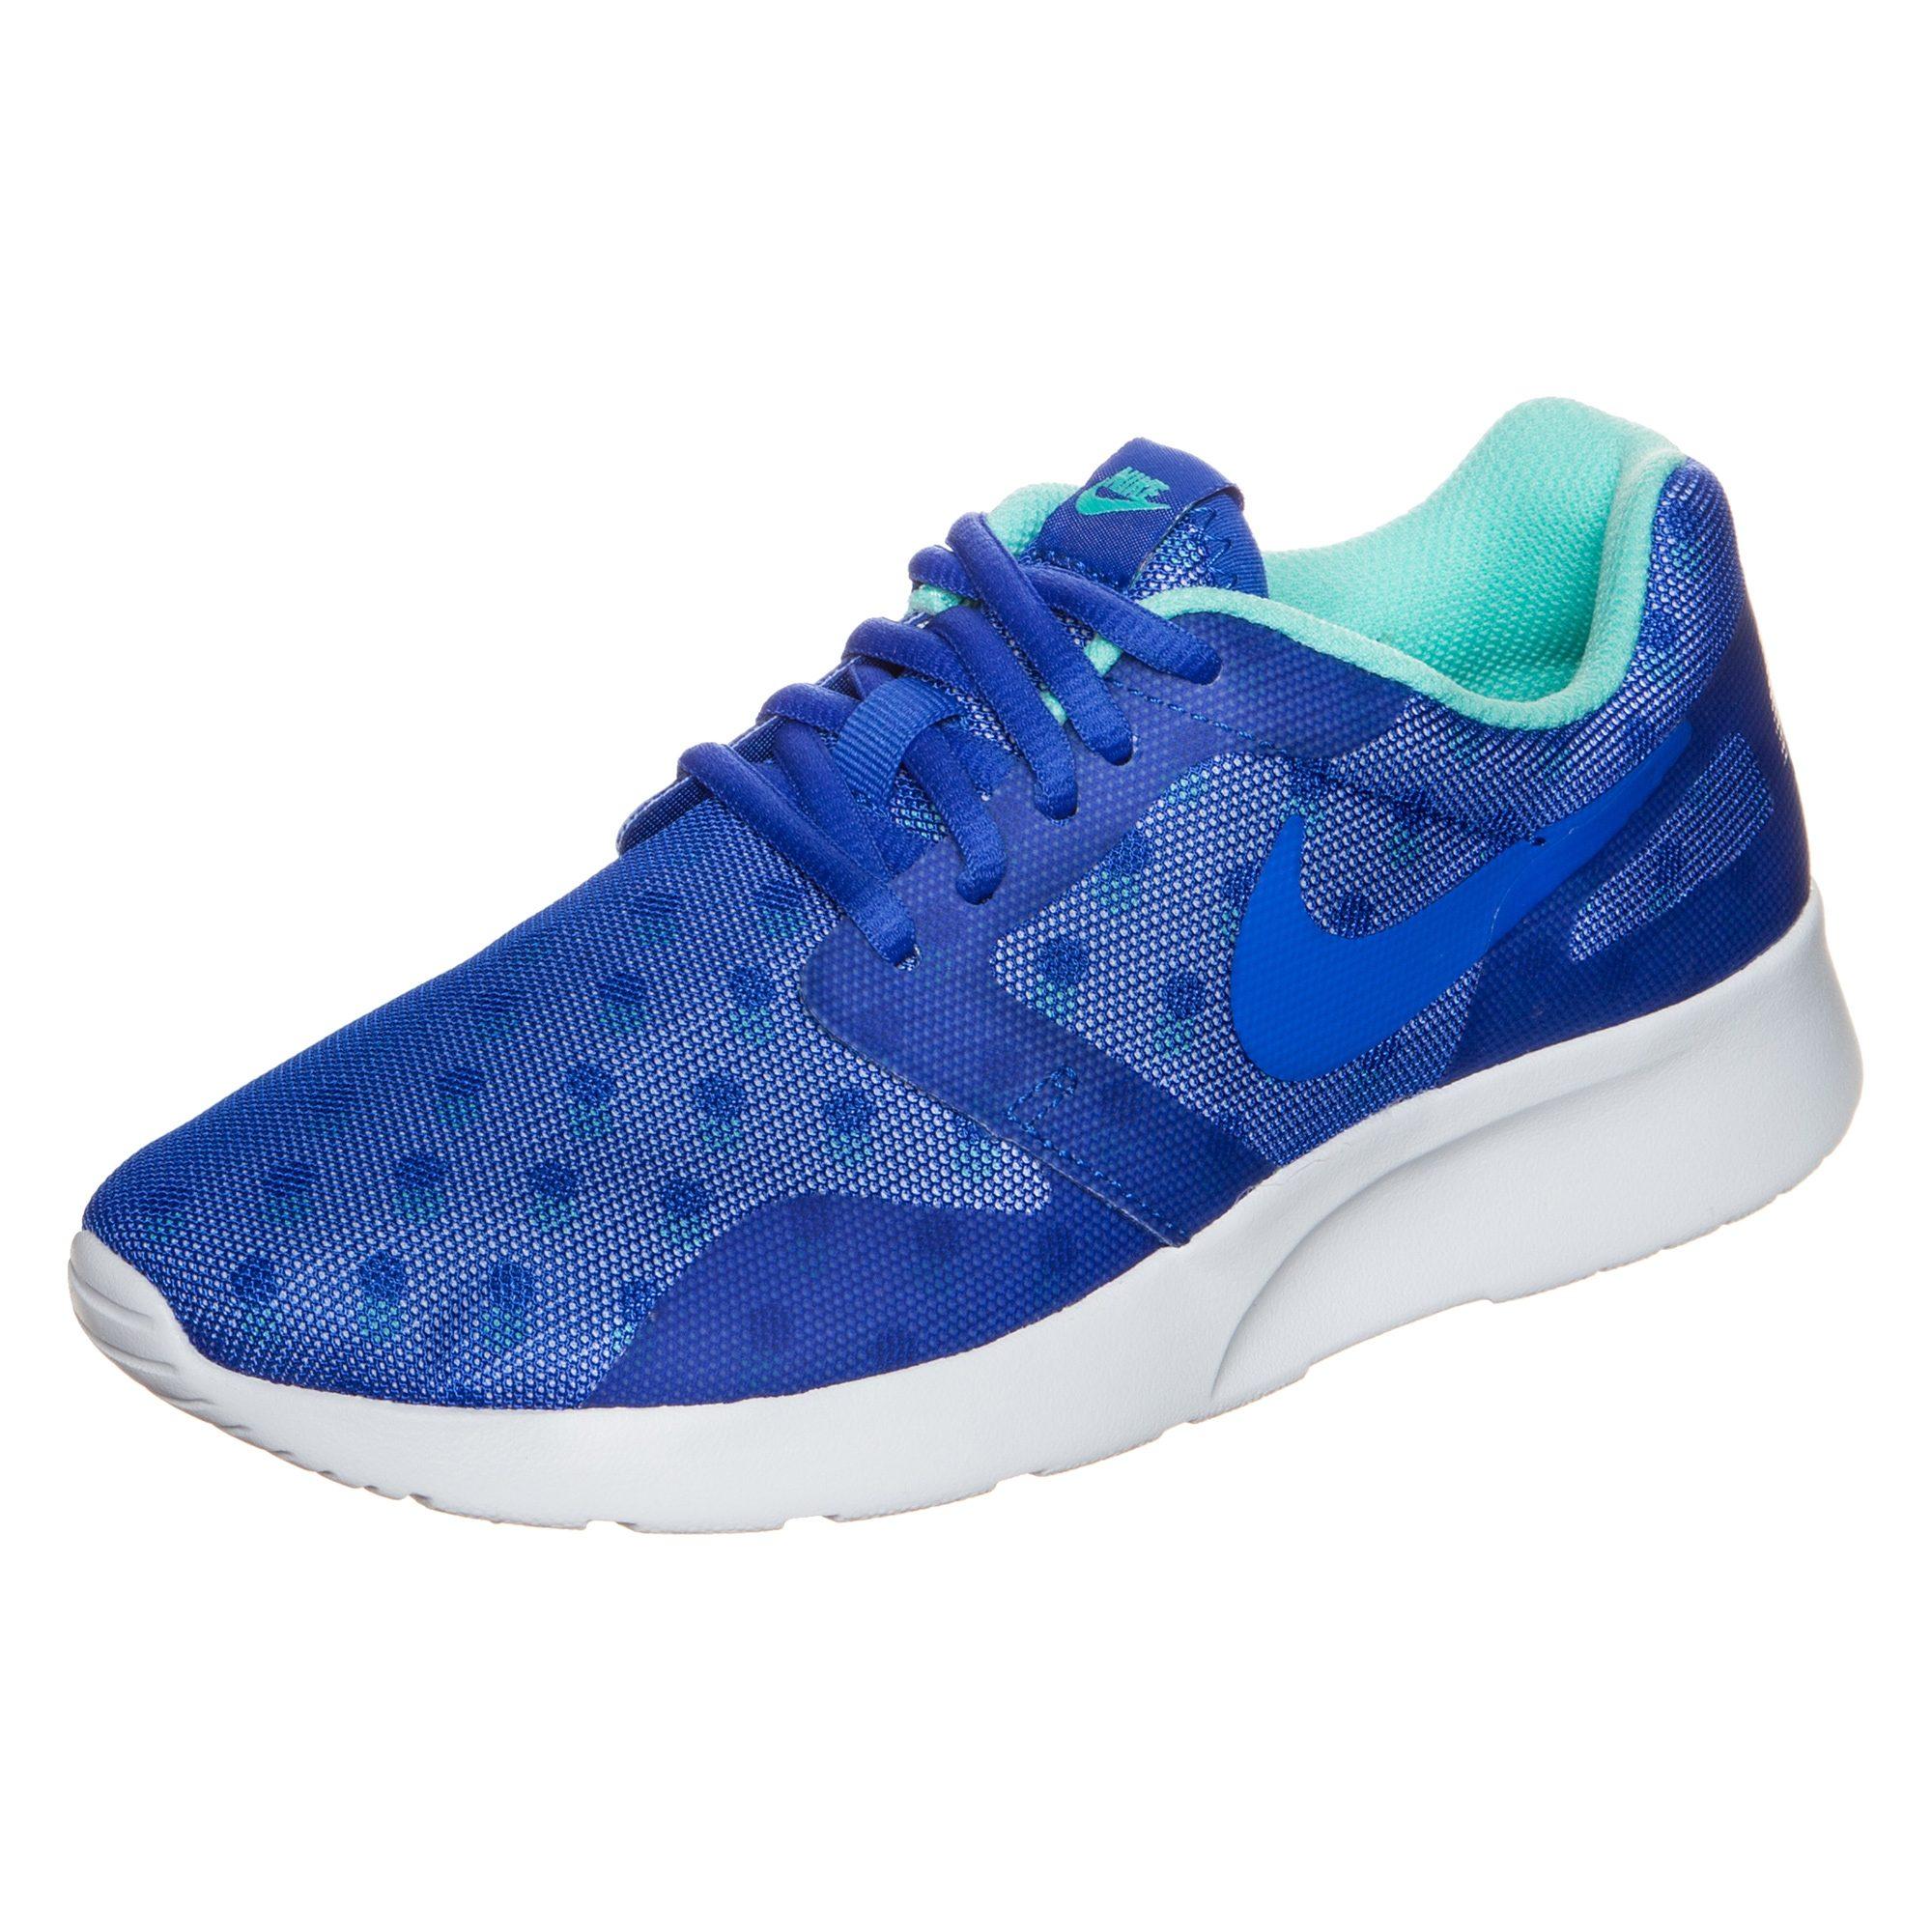 Nike Sportswear Kaishi Run Print Sneaker Damen  blau #ft5_slash# weiß #ft5_slash# mint